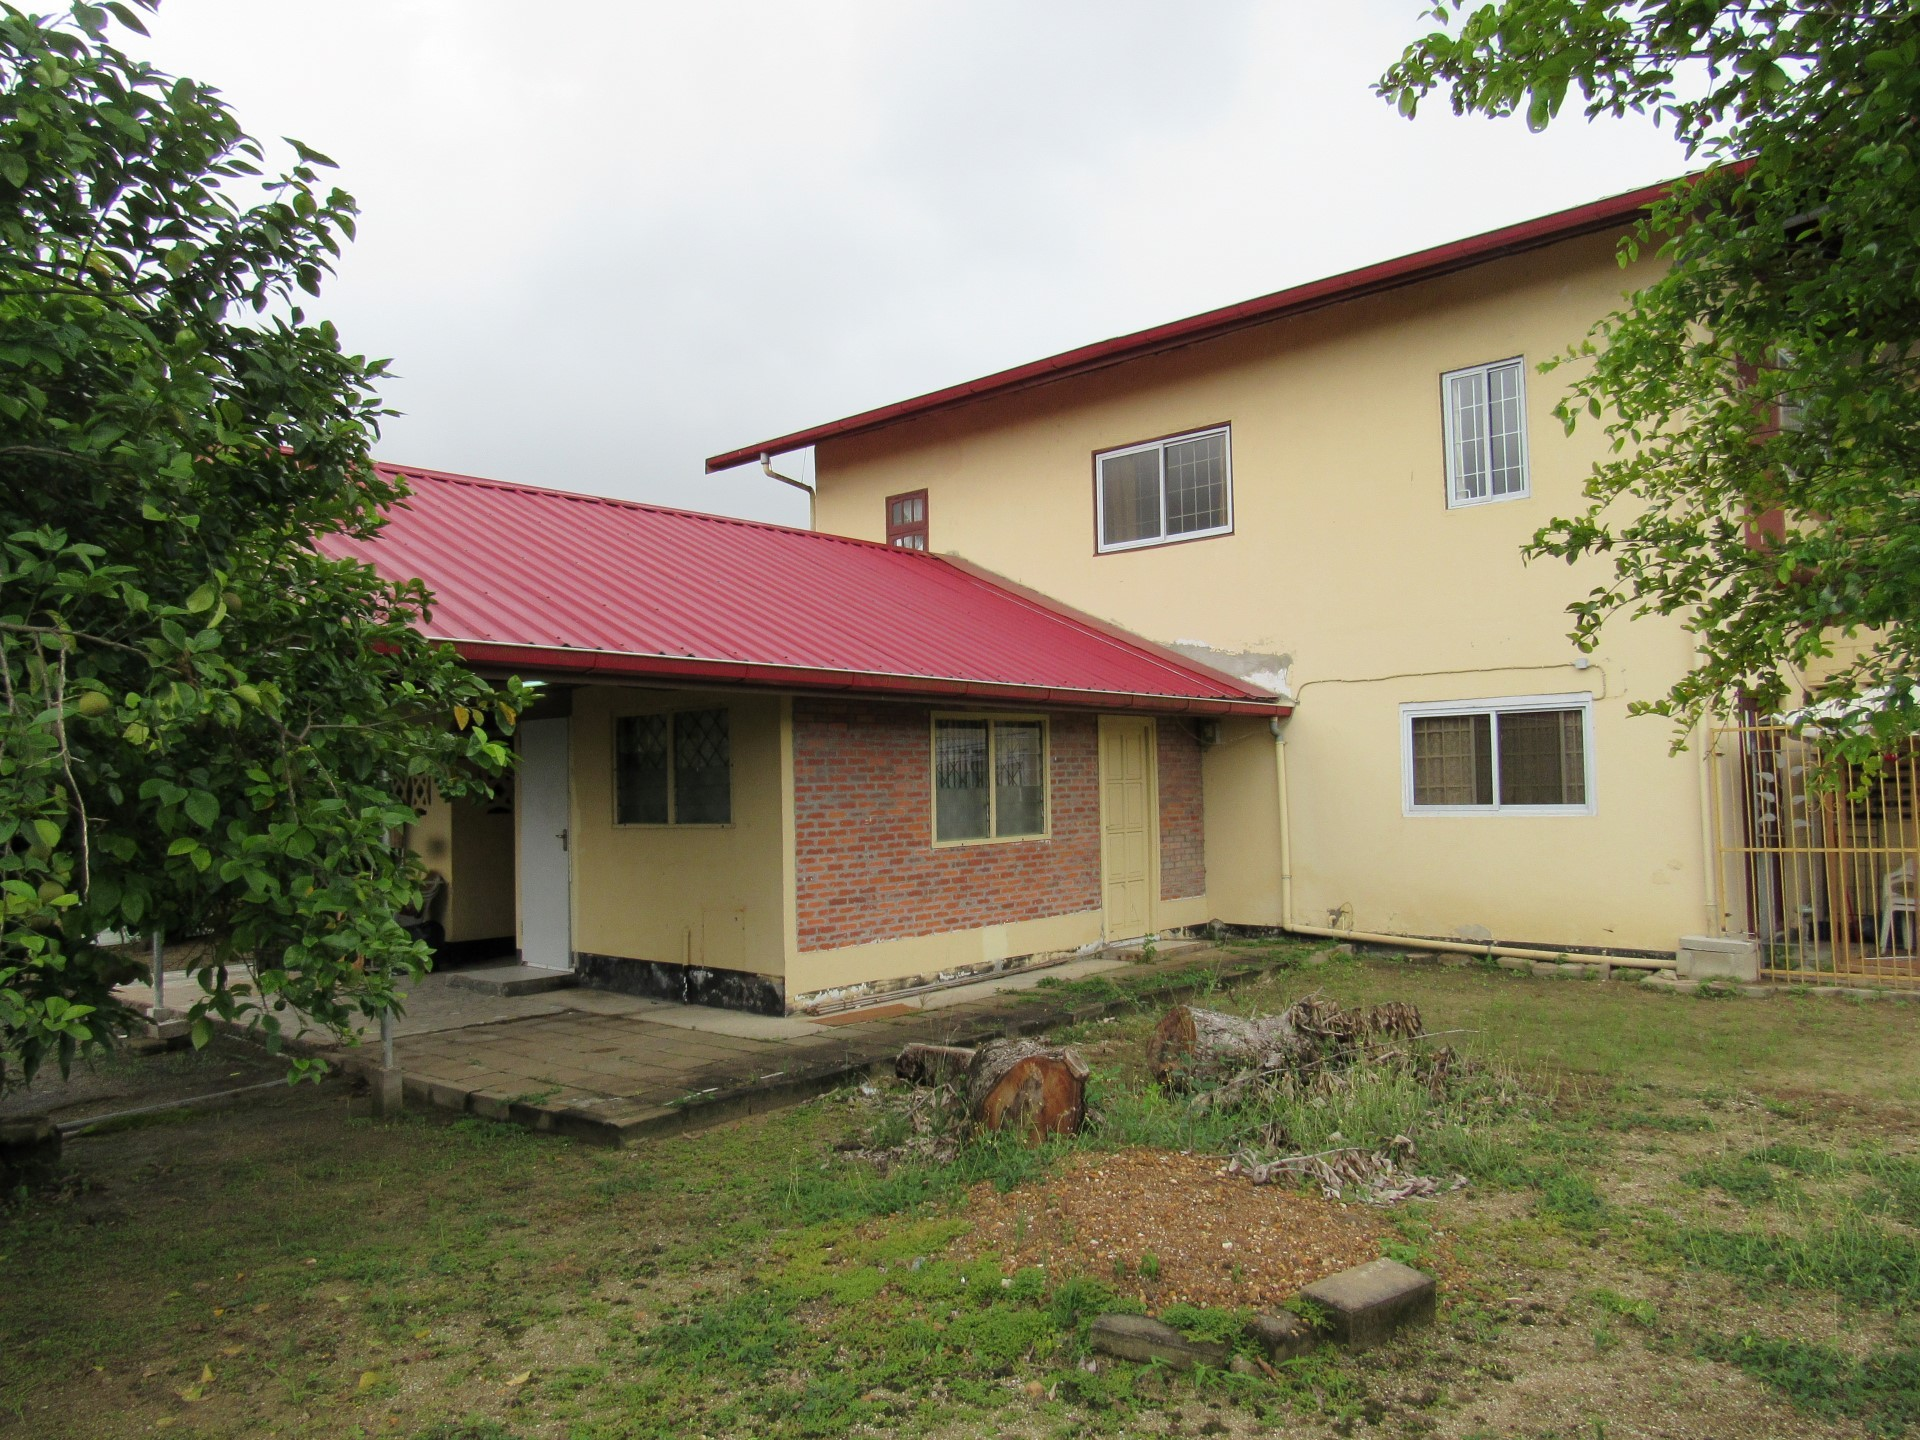 Henkielaan-32-Koopwoning-Terzol-Vastgoed-Paramaribo-Suriname-29